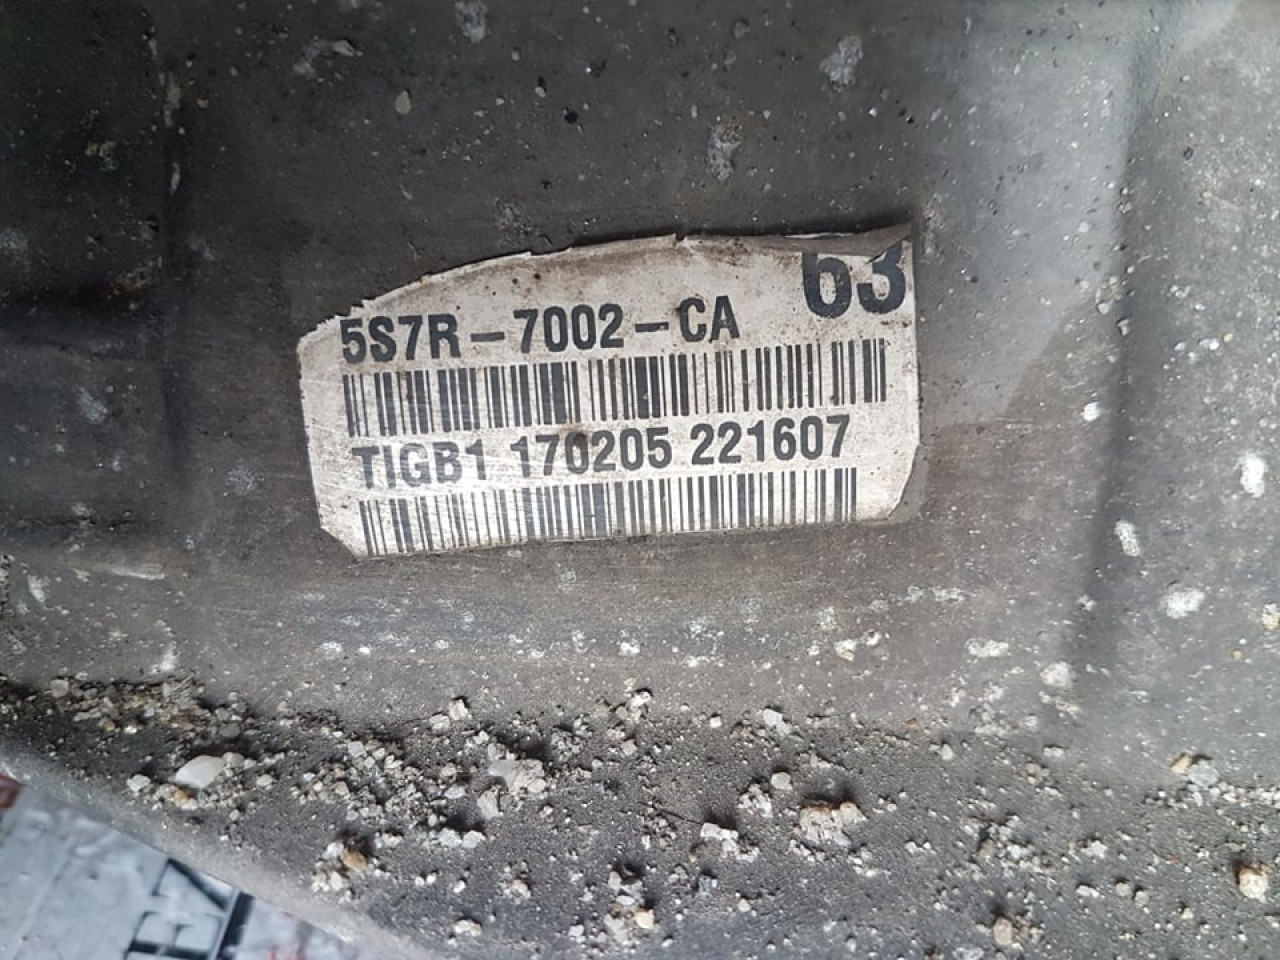 Cutie viteze manuala 6 trepte ford mondeo mk3 2.2 tdci 5S7R-7002-CA